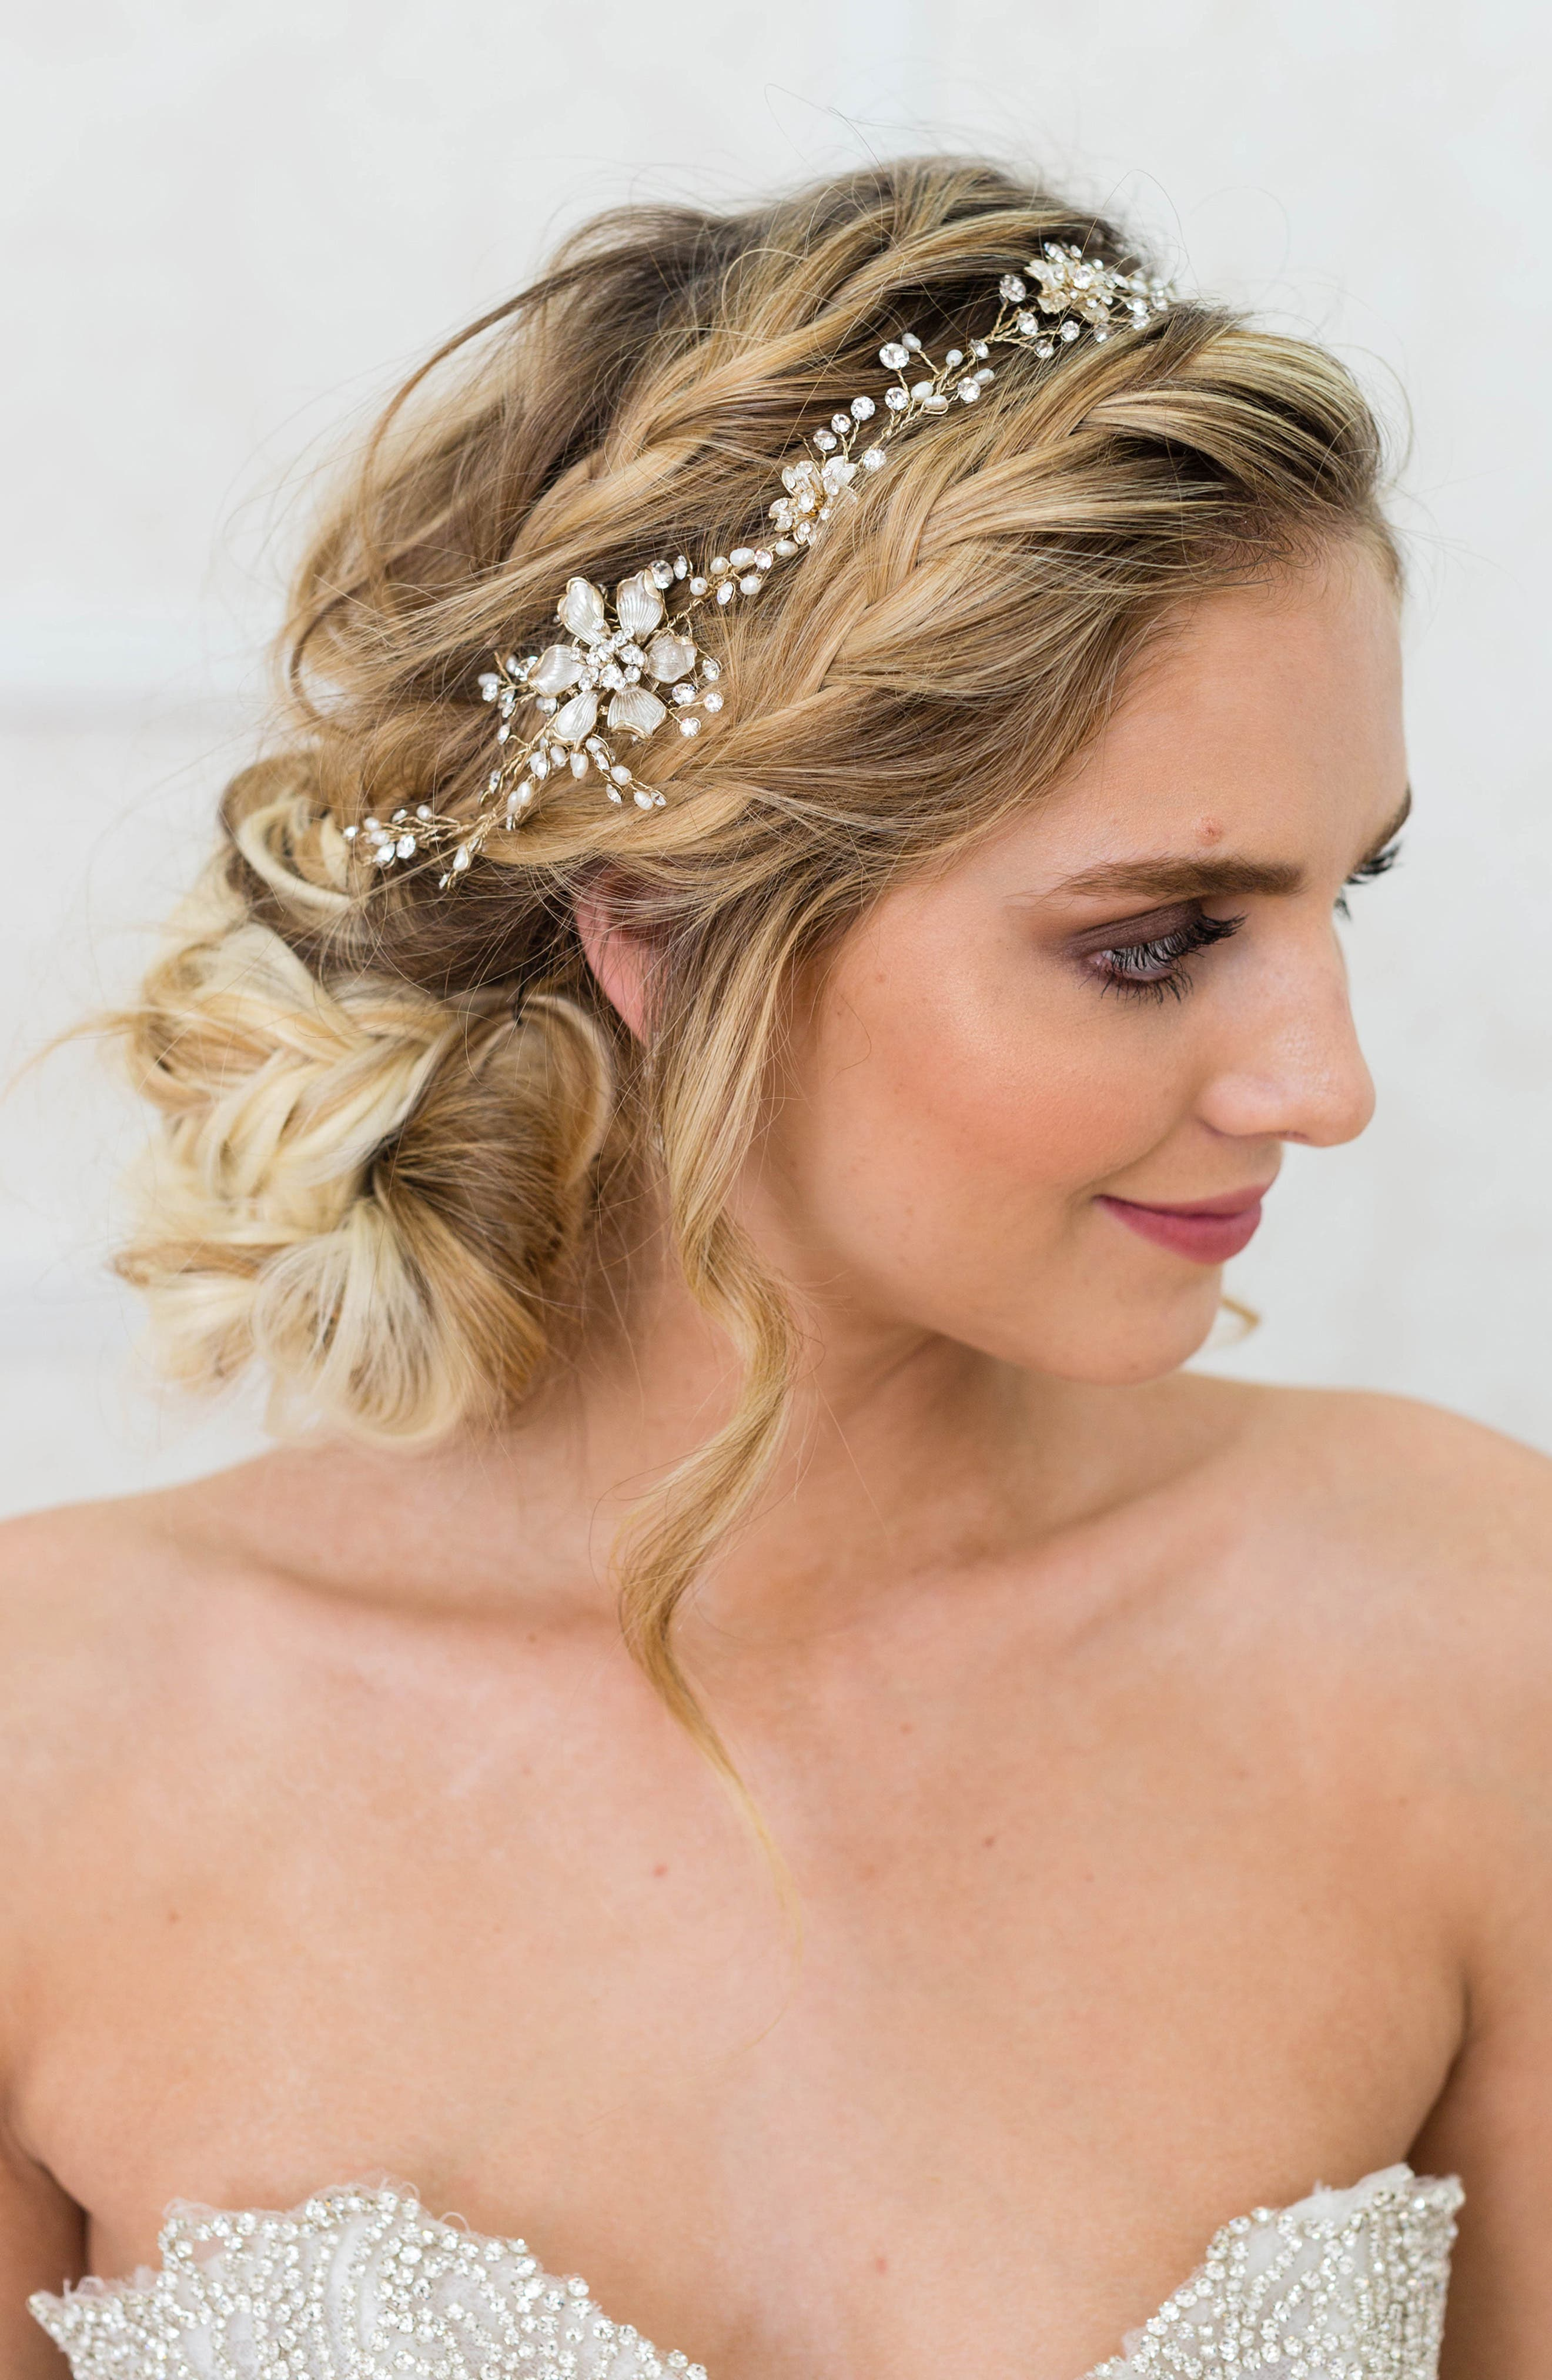 BRIDES & HAIRPINS Atiena Embellished Floral Motif Halo & Sash, Main, color, 14 K GOLD